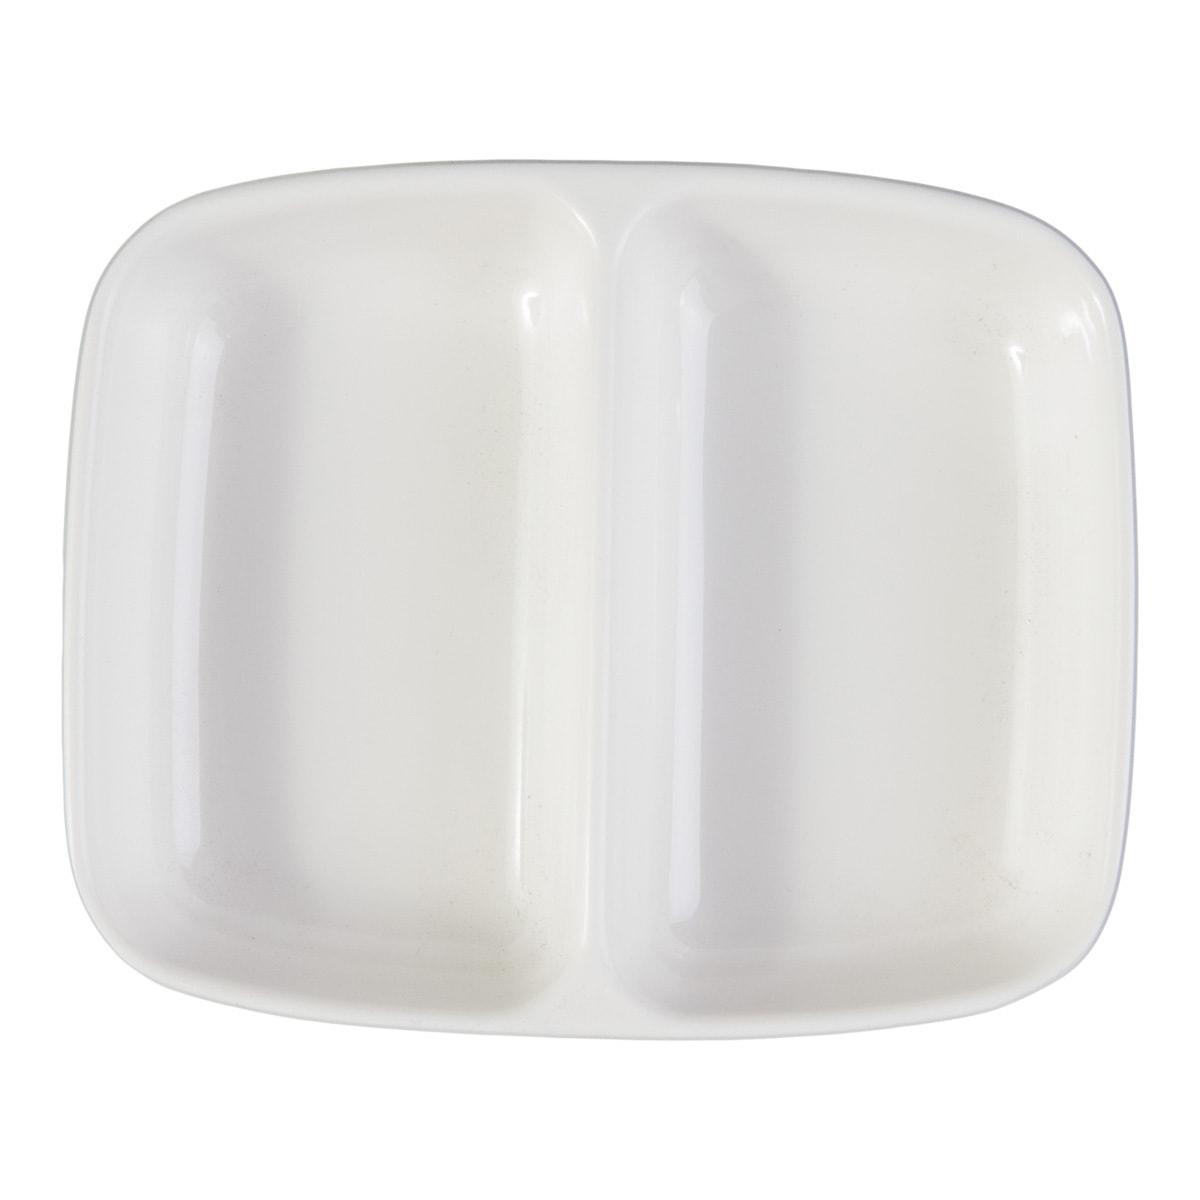 Yamibuy.com:Customer reviews:Melamine Twin Sauce Dish White Microwave Safe